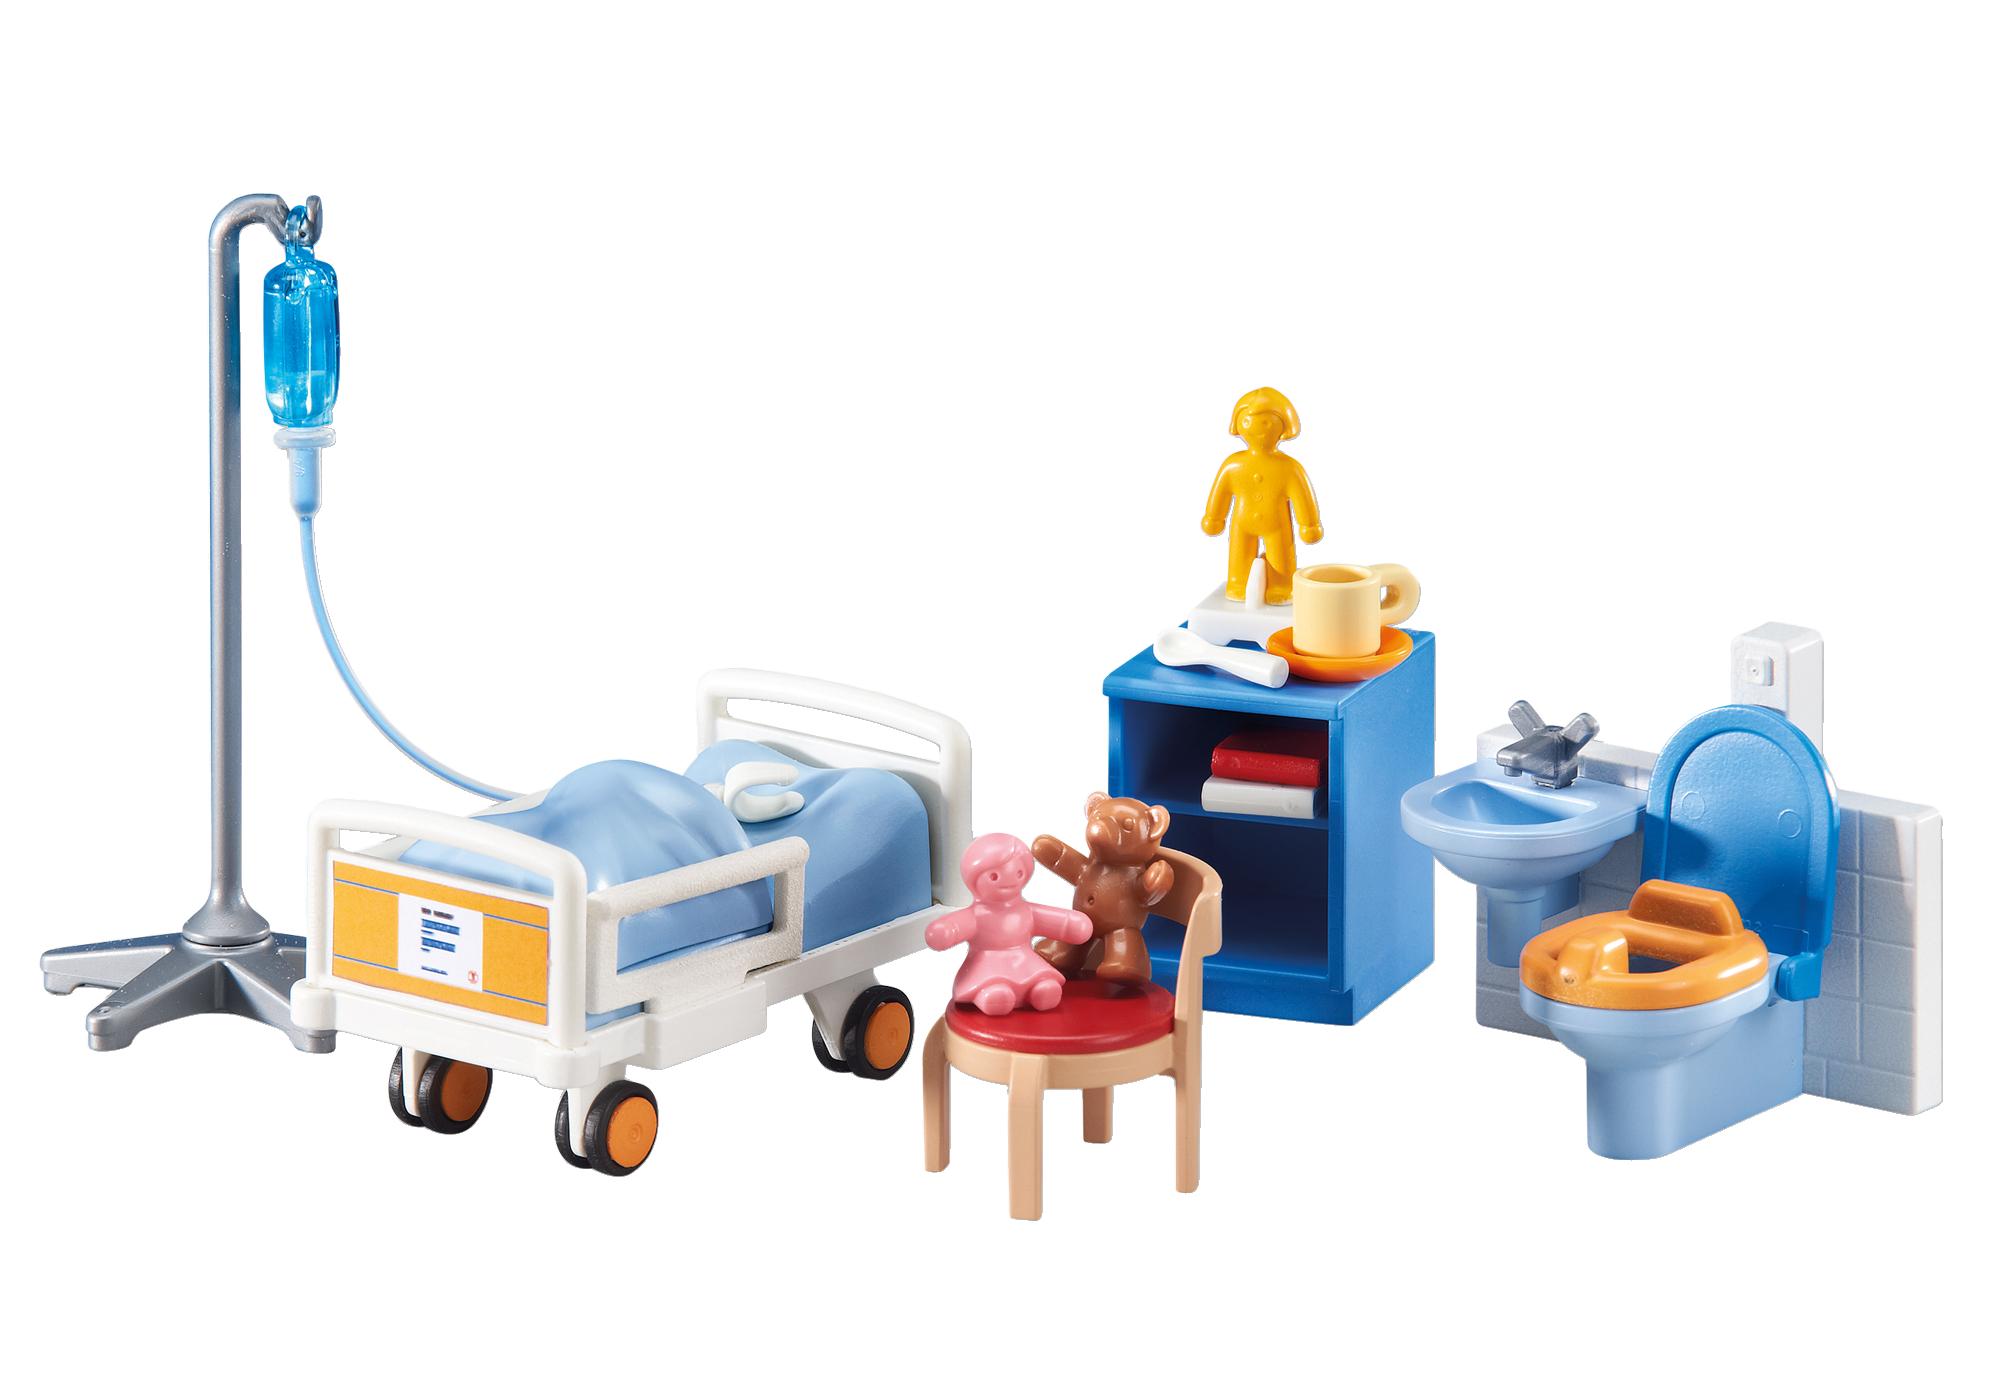 http://media.playmobil.com/i/playmobil/6444_product_detail/Kinderziekenhuiskamer